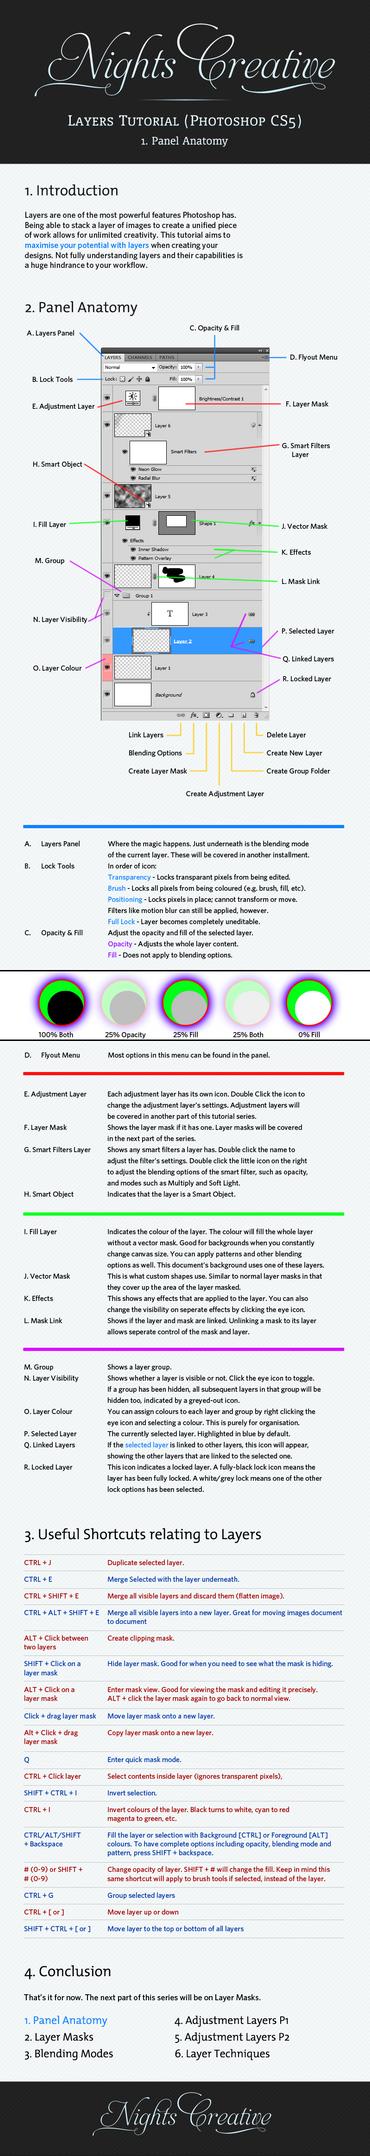 Layers Tutorial 1 - Anatomy by NightsCreative